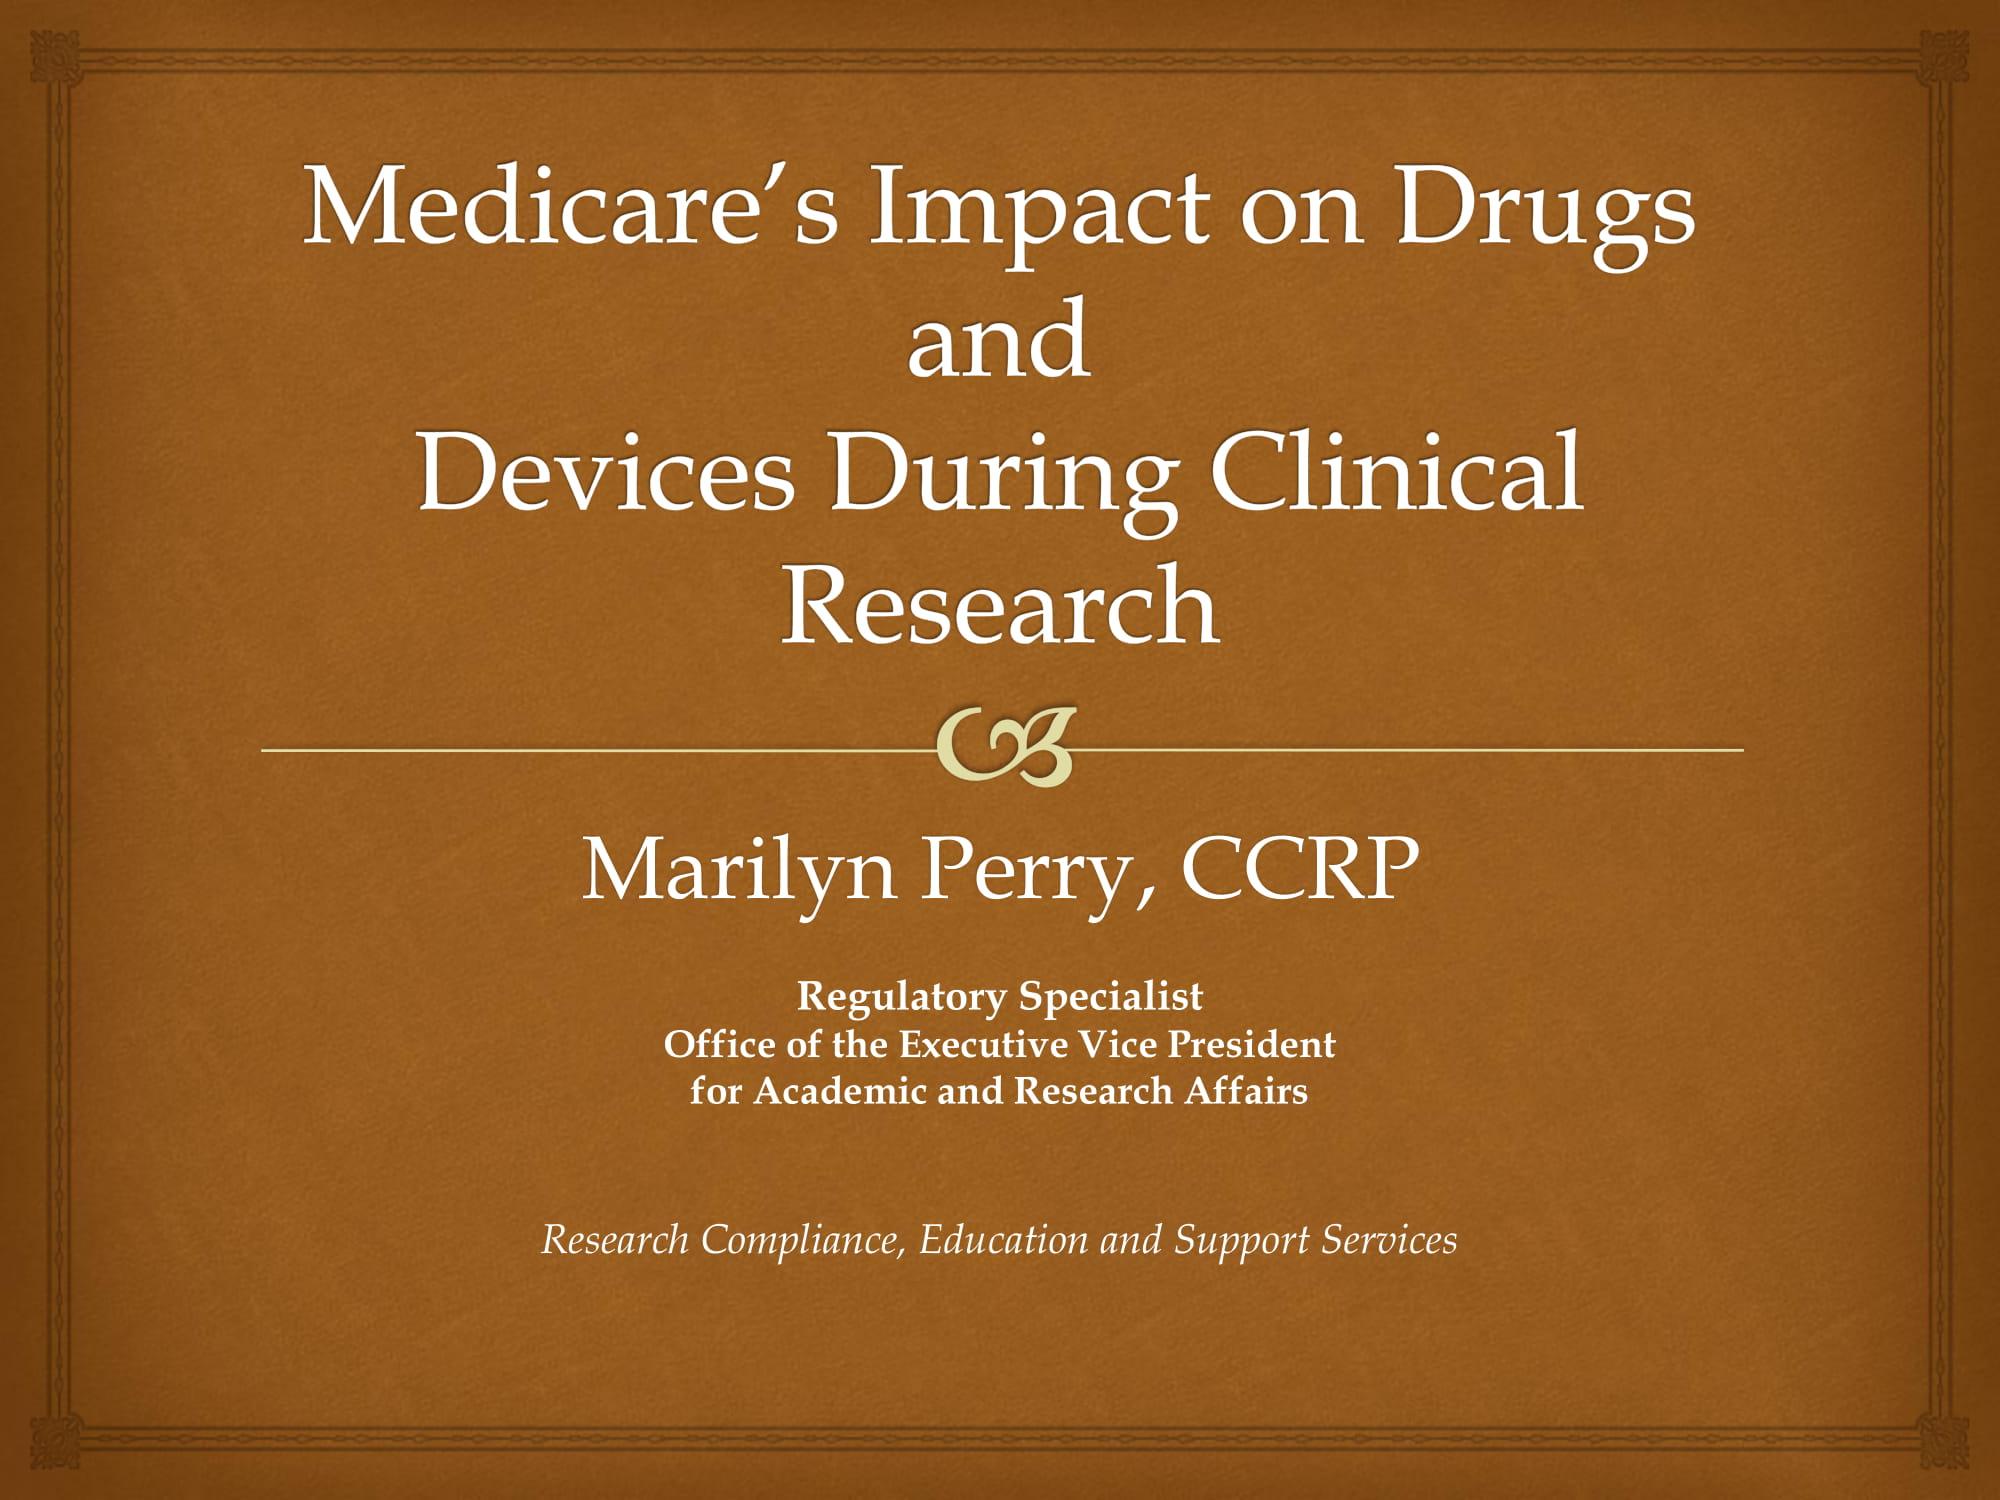 medicare coverage analysis 2013